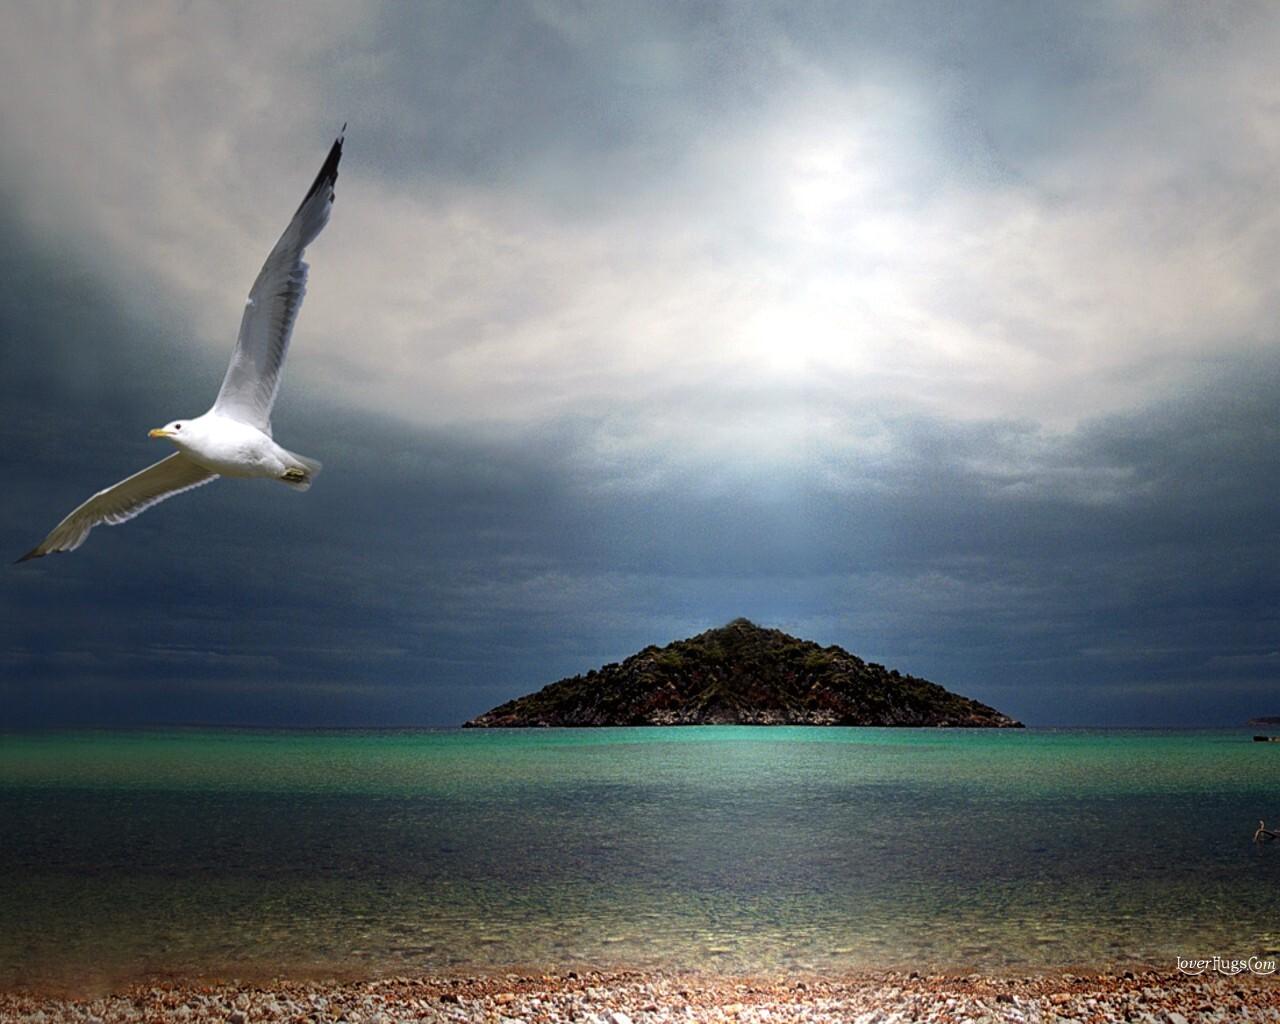 http://4.bp.blogspot.com/-qpUQ0-4YkuE/T3TEmy5O31I/AAAAAAAAG5k/8eEe4Pp3d38/s1600/Birds_9999532.jpg